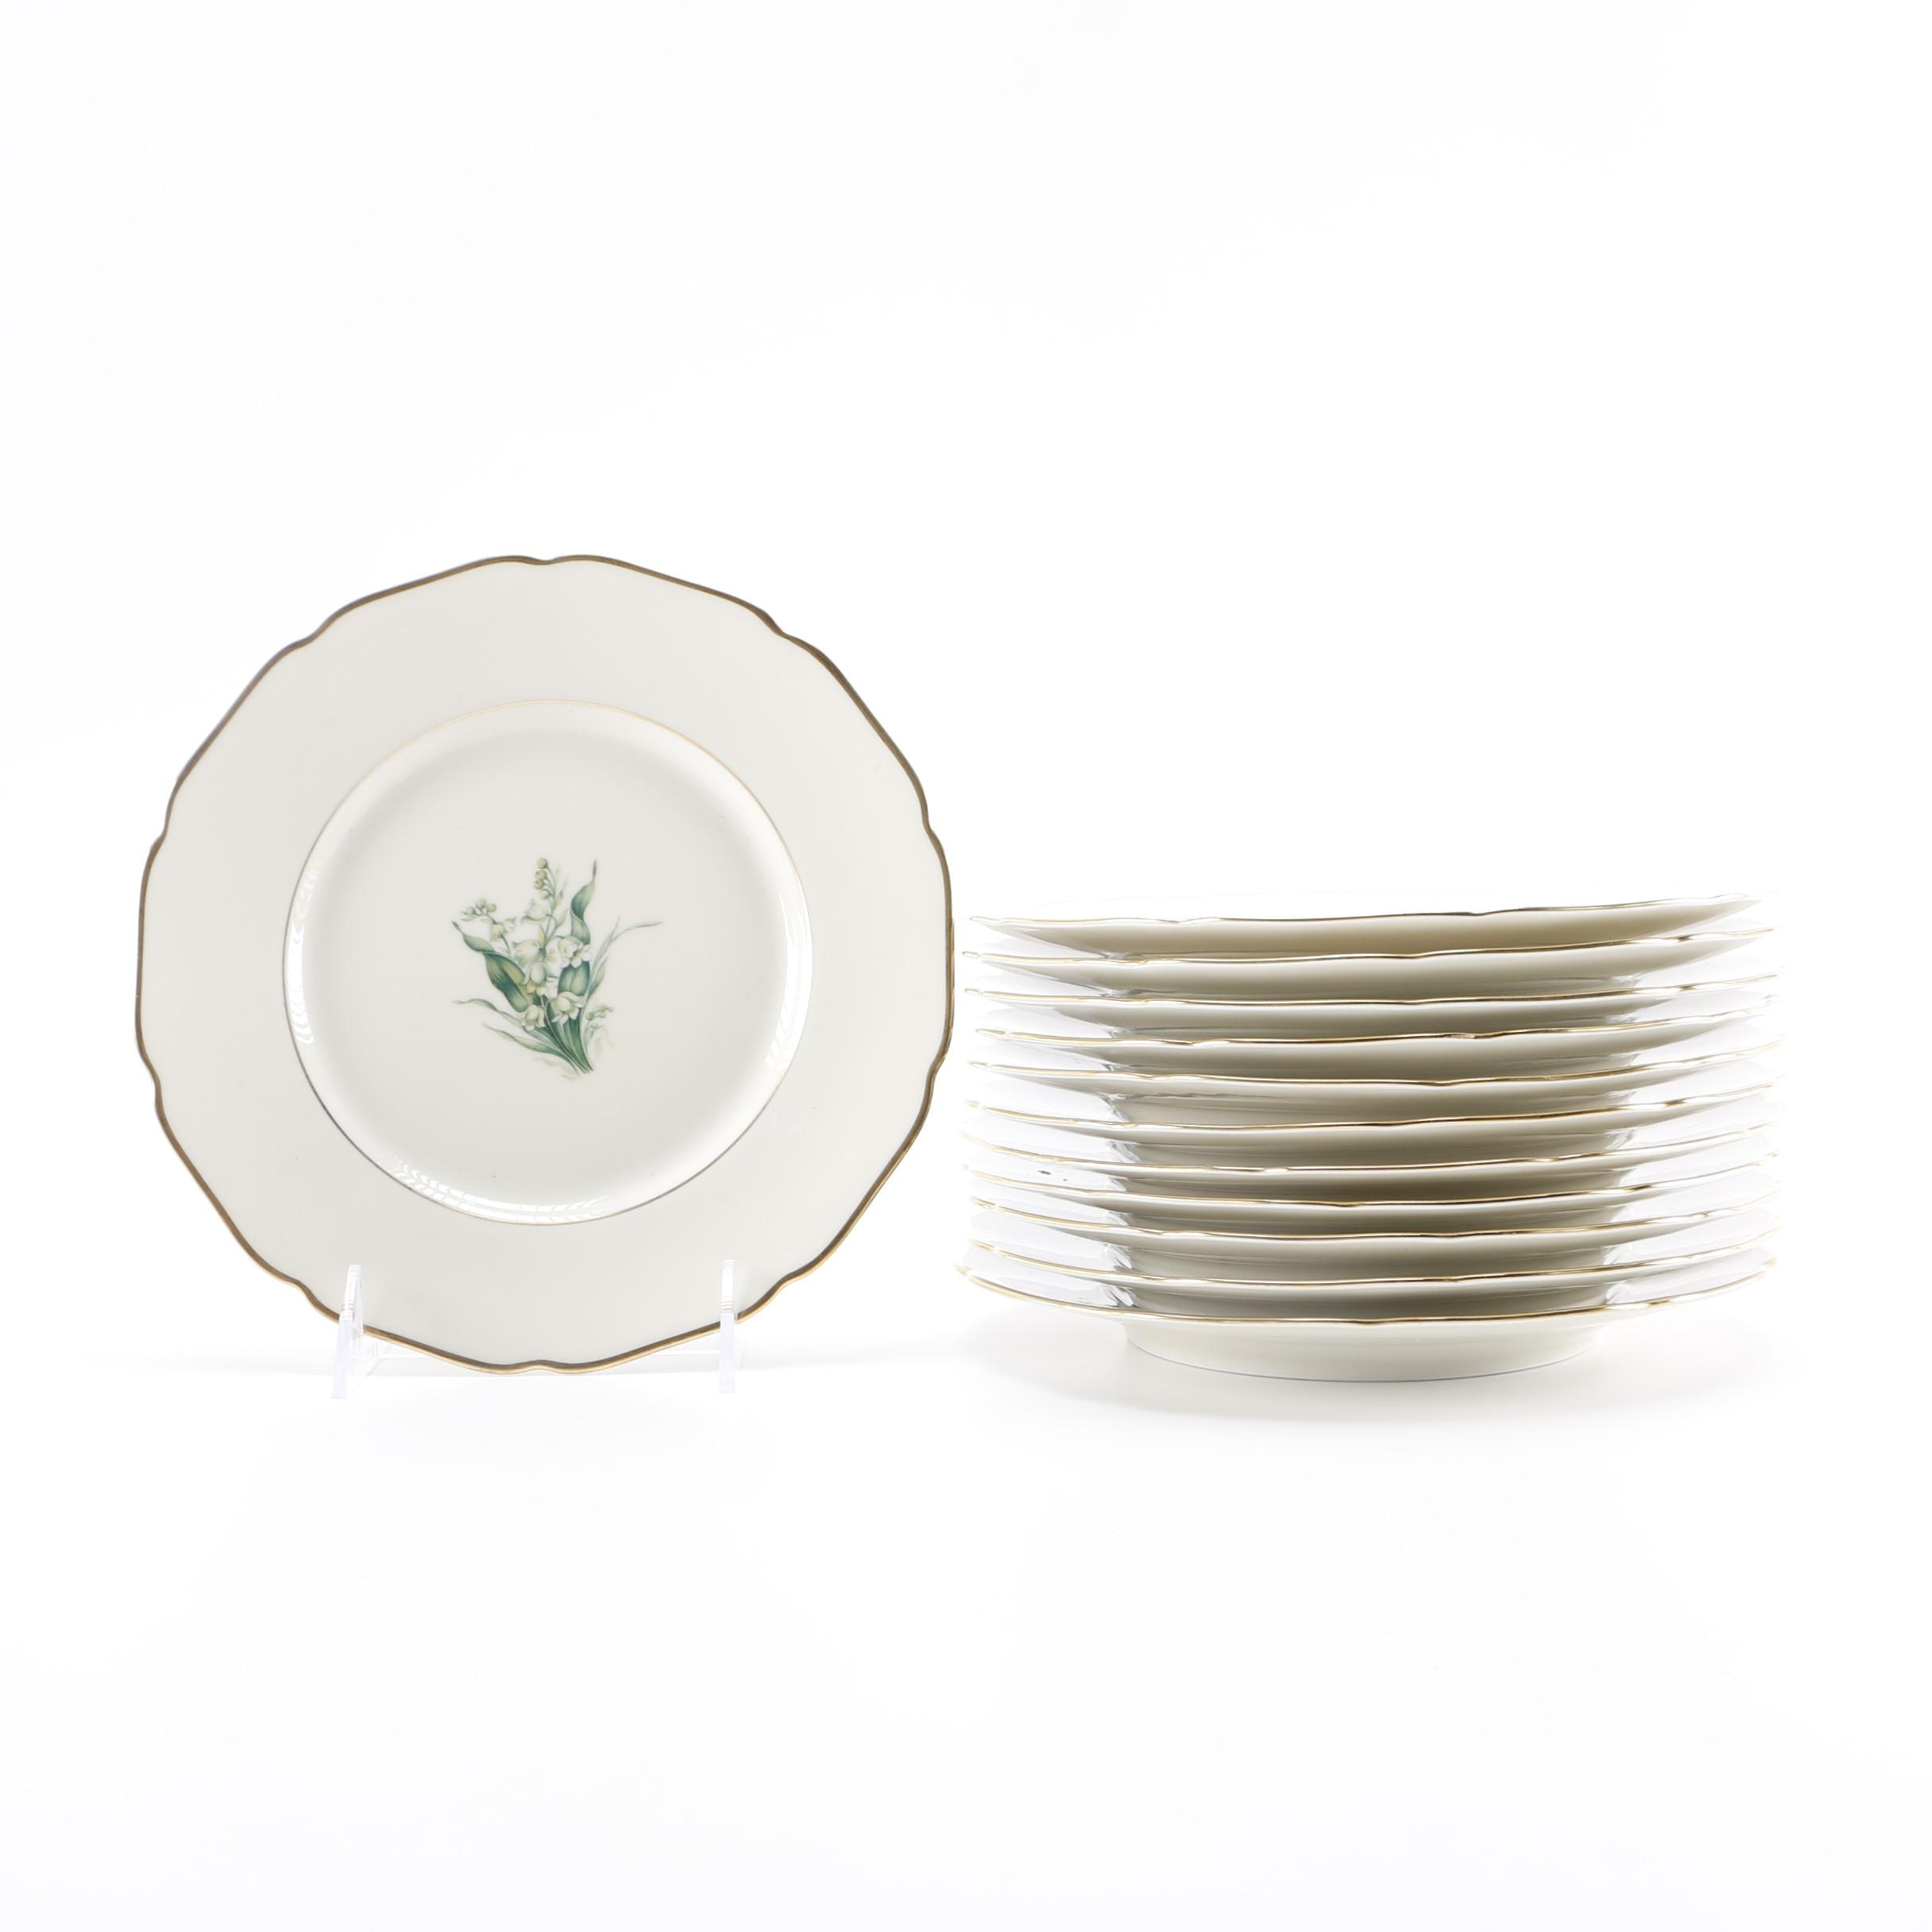 Twelve German Royal York  Lily of the Valley  China Plates ...  sc 1 st  EBTH.com & Twelve German Royal York